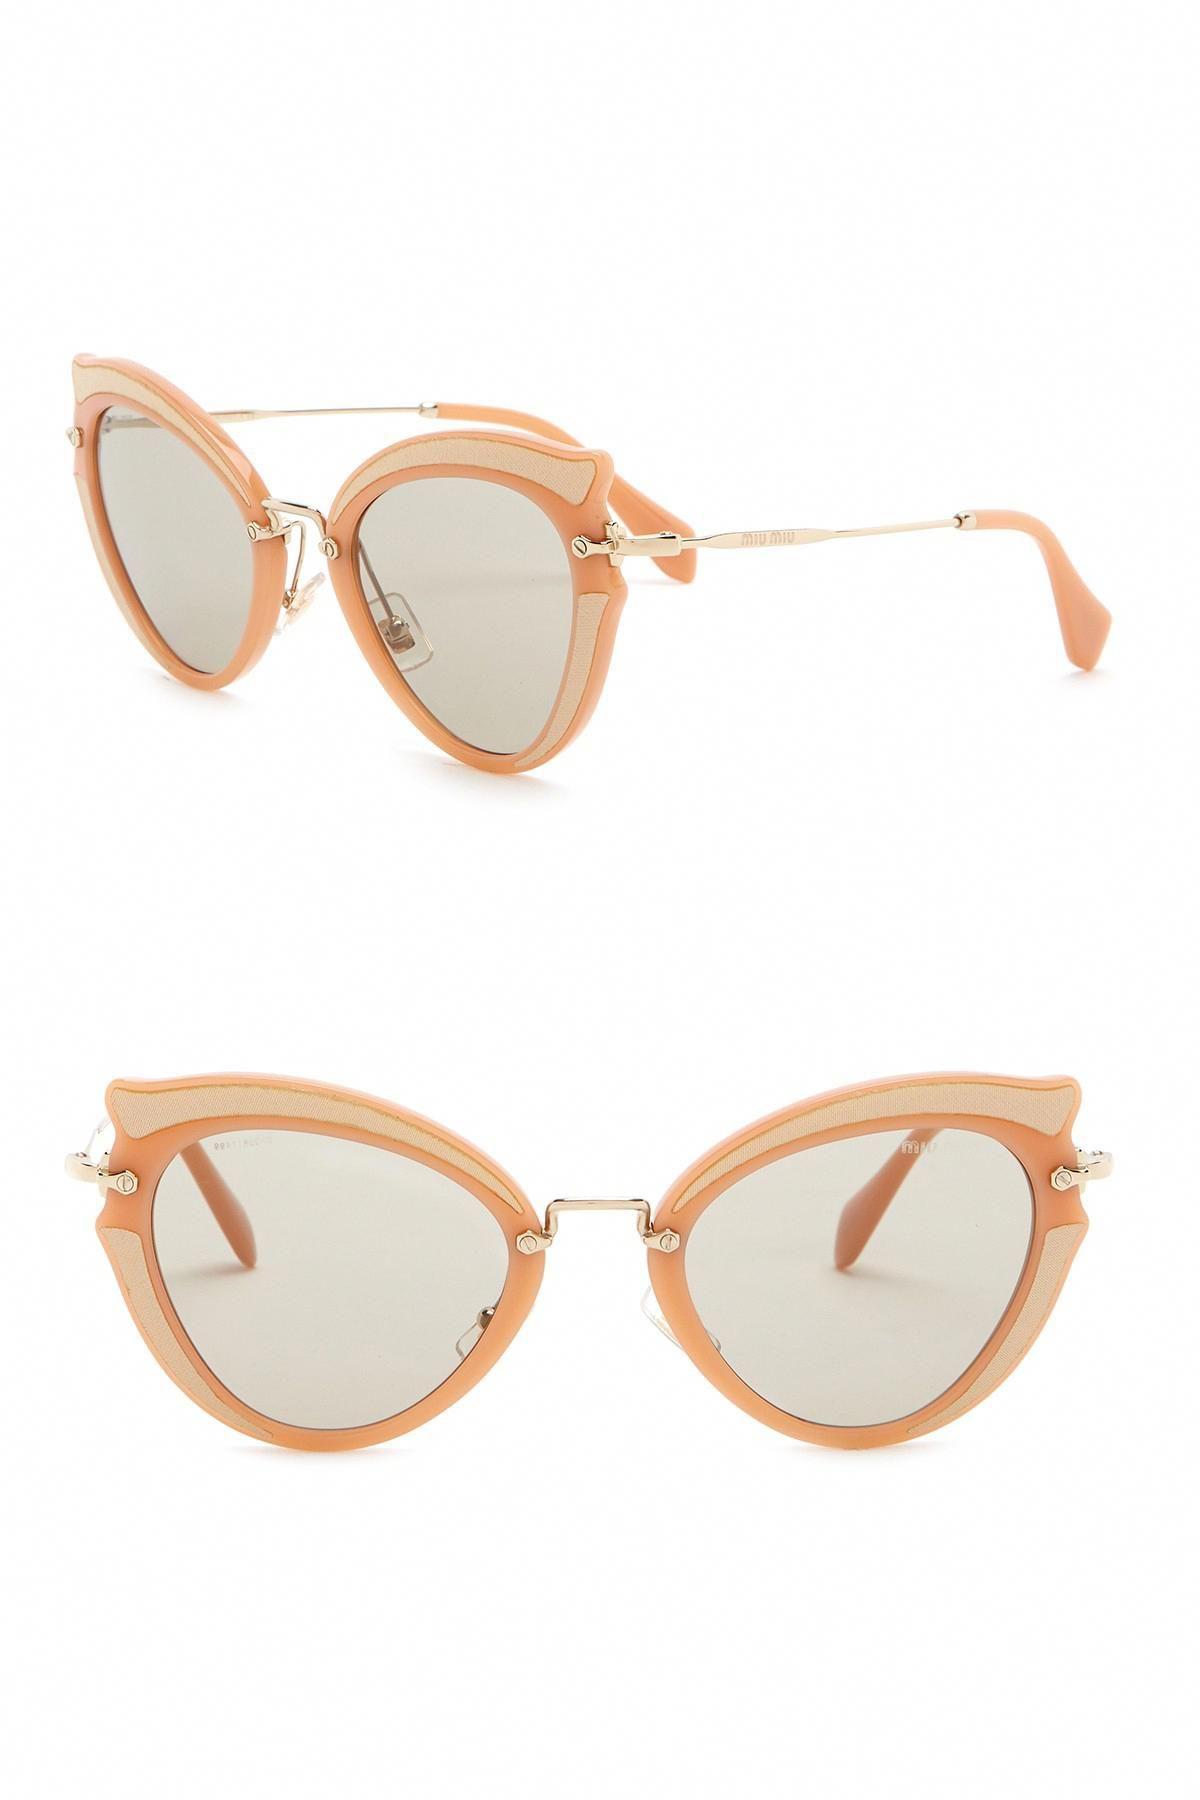 157b028cb08c MIU MIU - Women s Butterfly 52mm Acetate Frame Sunglasses is now 79% off.  Free